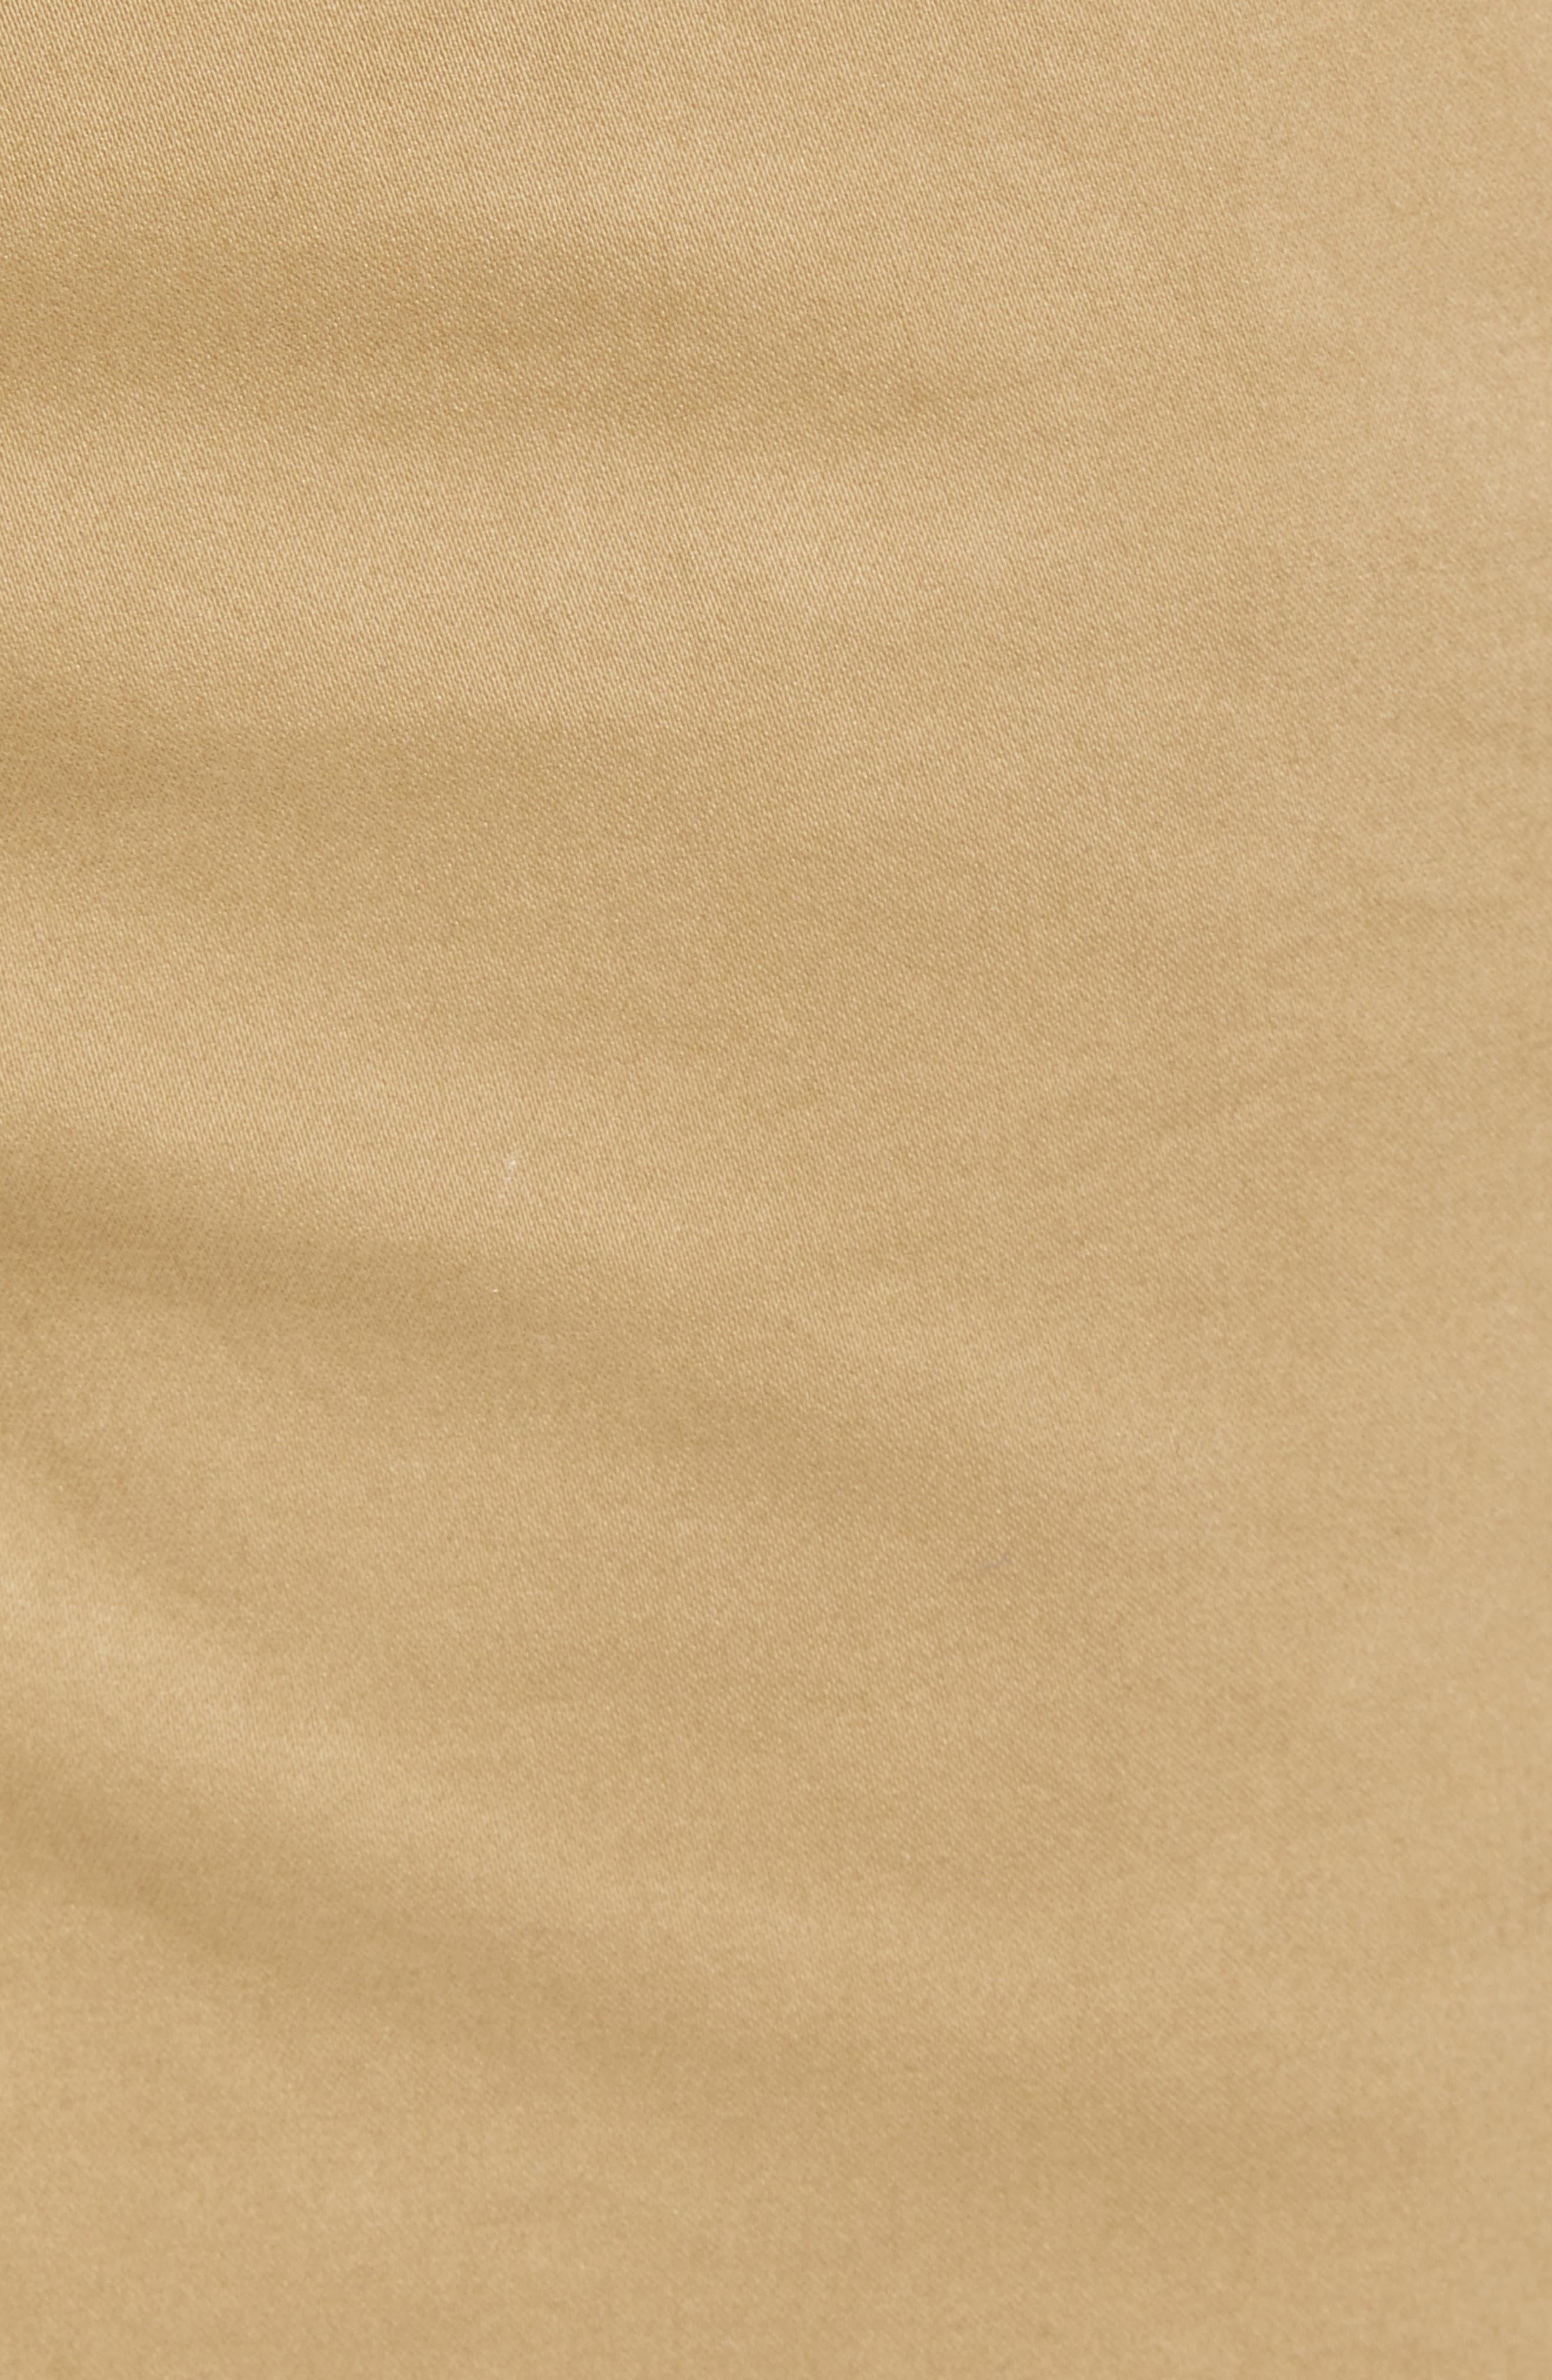 Slim Fit Shorts,                             Alternate thumbnail 5, color,                             200